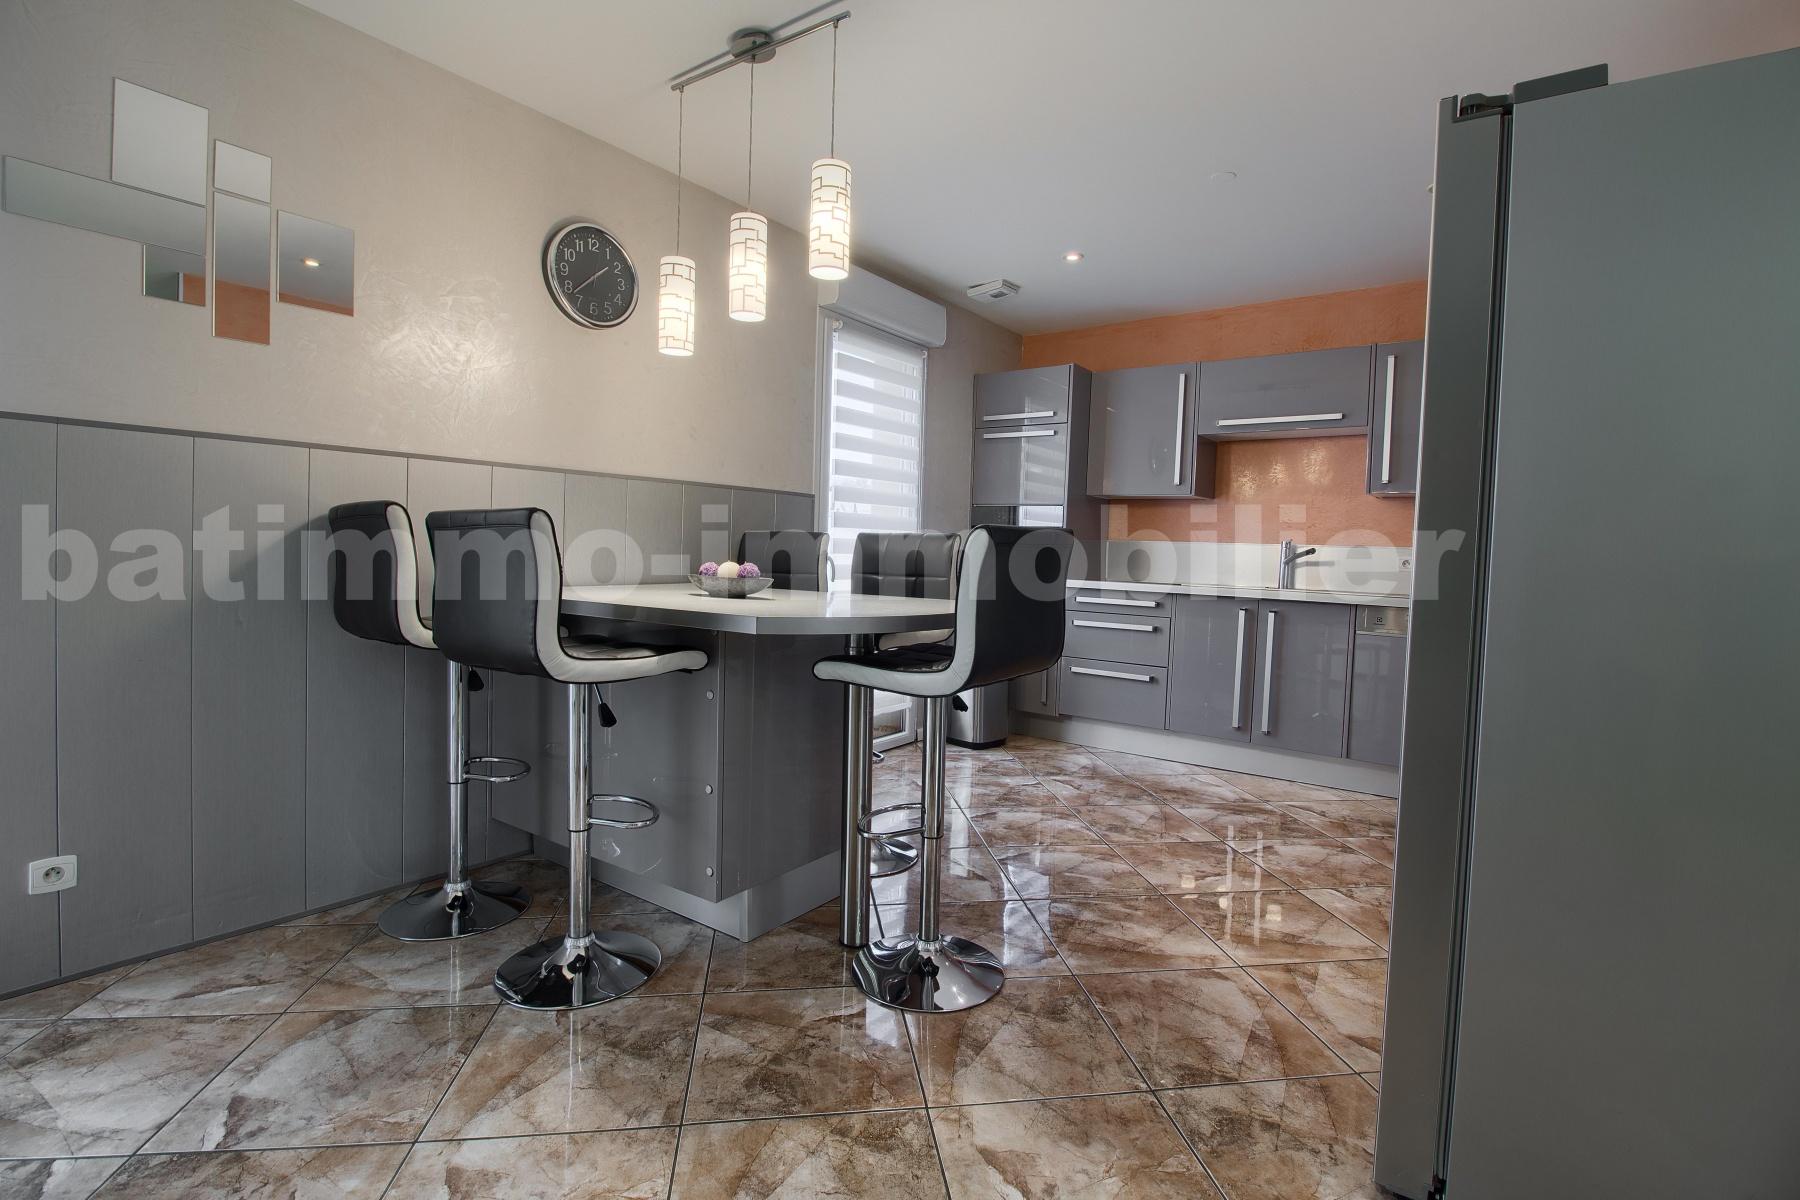 annonce vente maison marly 57155 165 m 355 000 992740006454. Black Bedroom Furniture Sets. Home Design Ideas